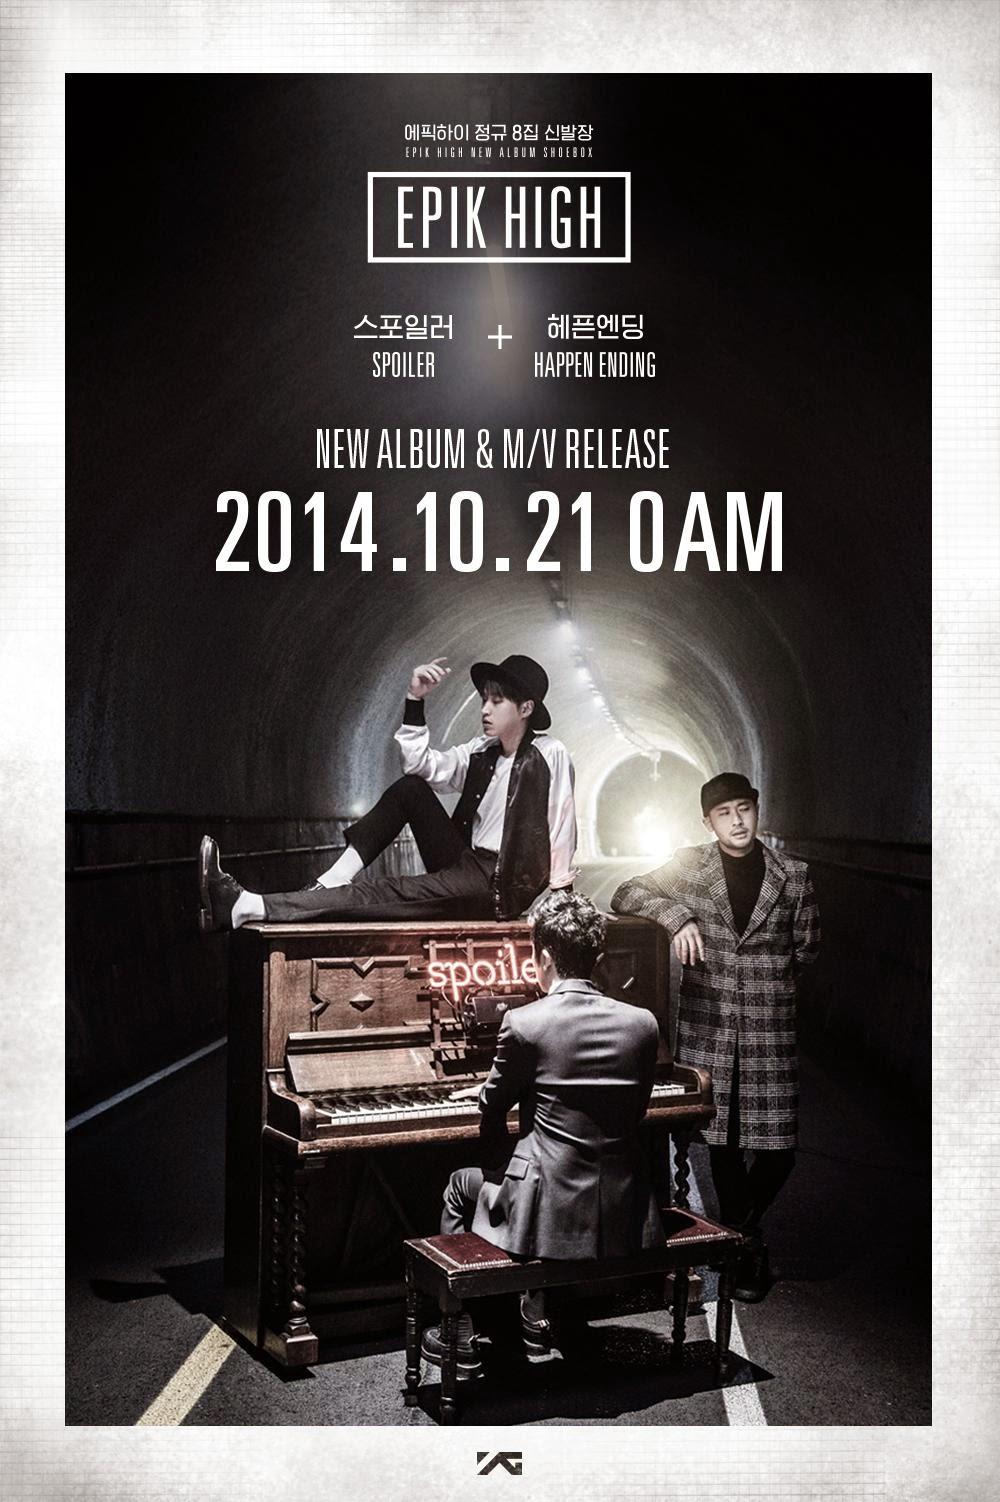 EPIK HIGH to release MVs for 'Spoiler' & 'Happen Ending' ft. Kim Ji Soo